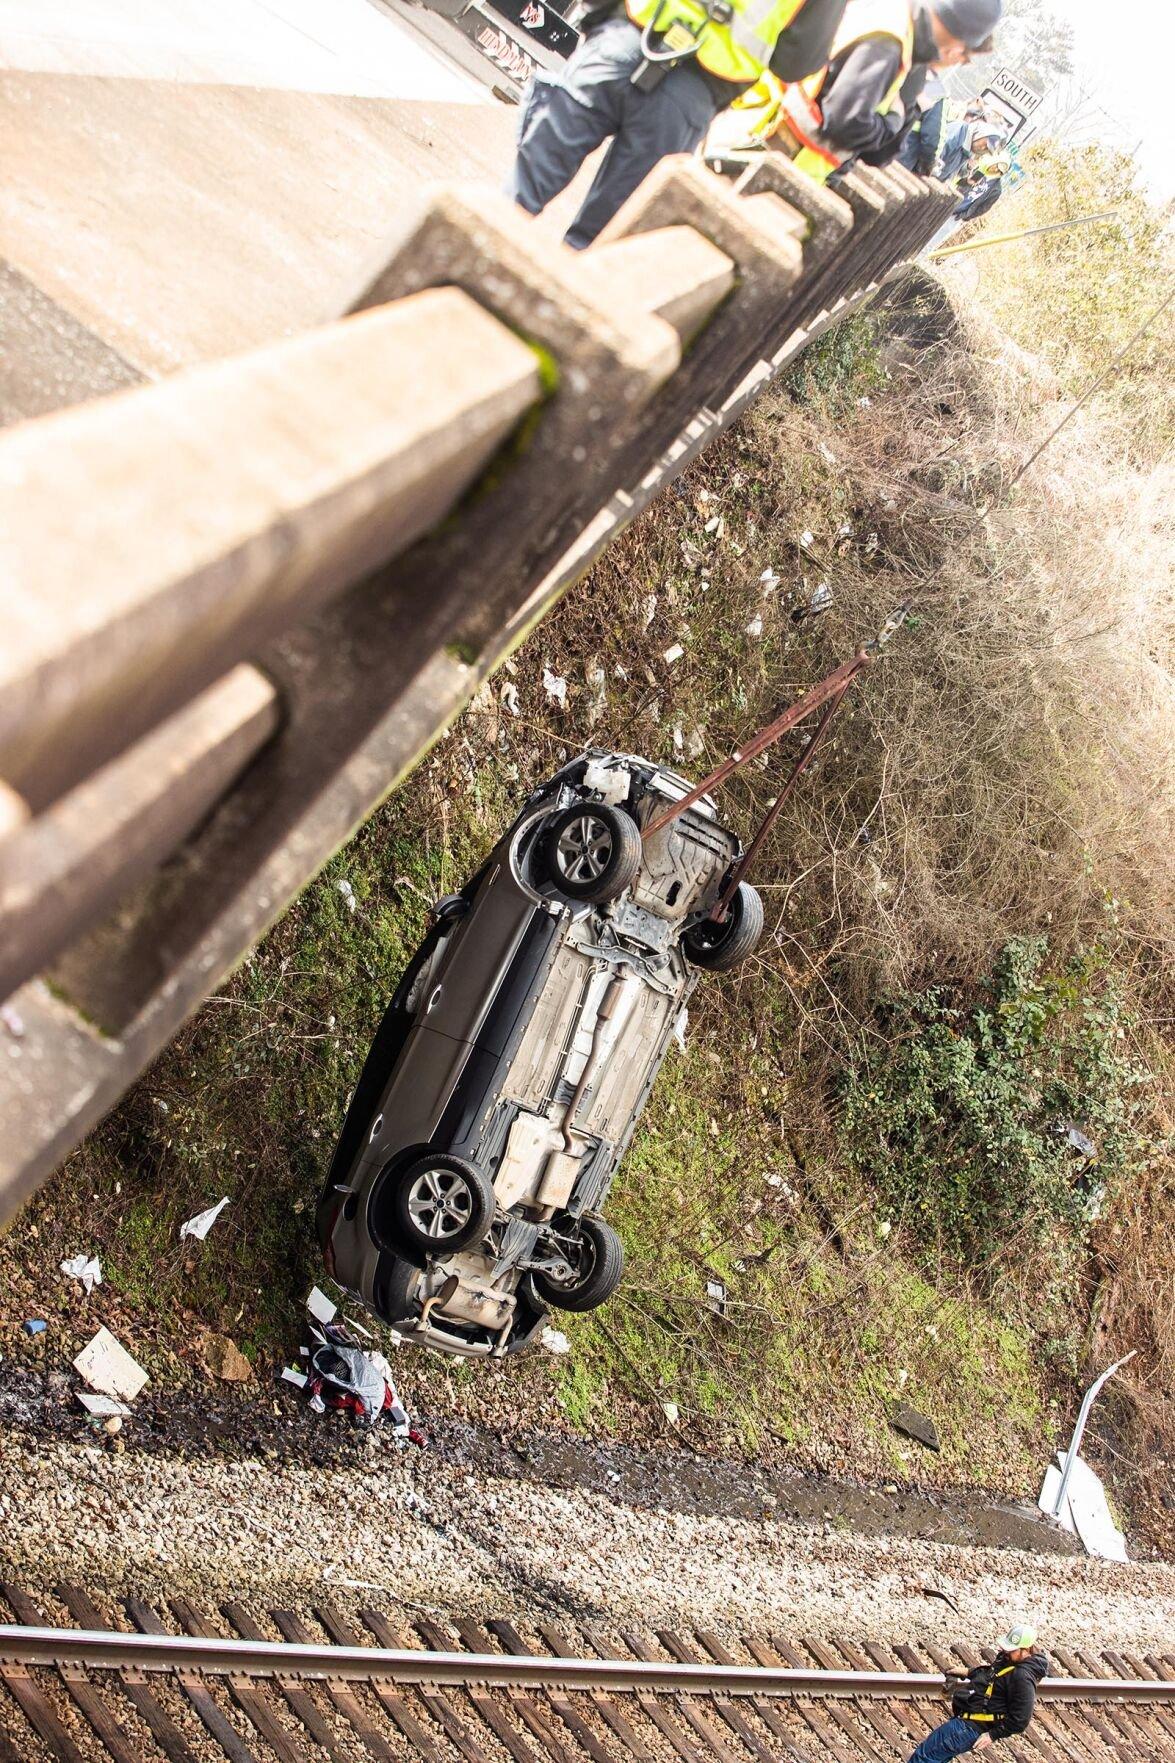 Vehicle Plunges down embankment1-bc.jpg